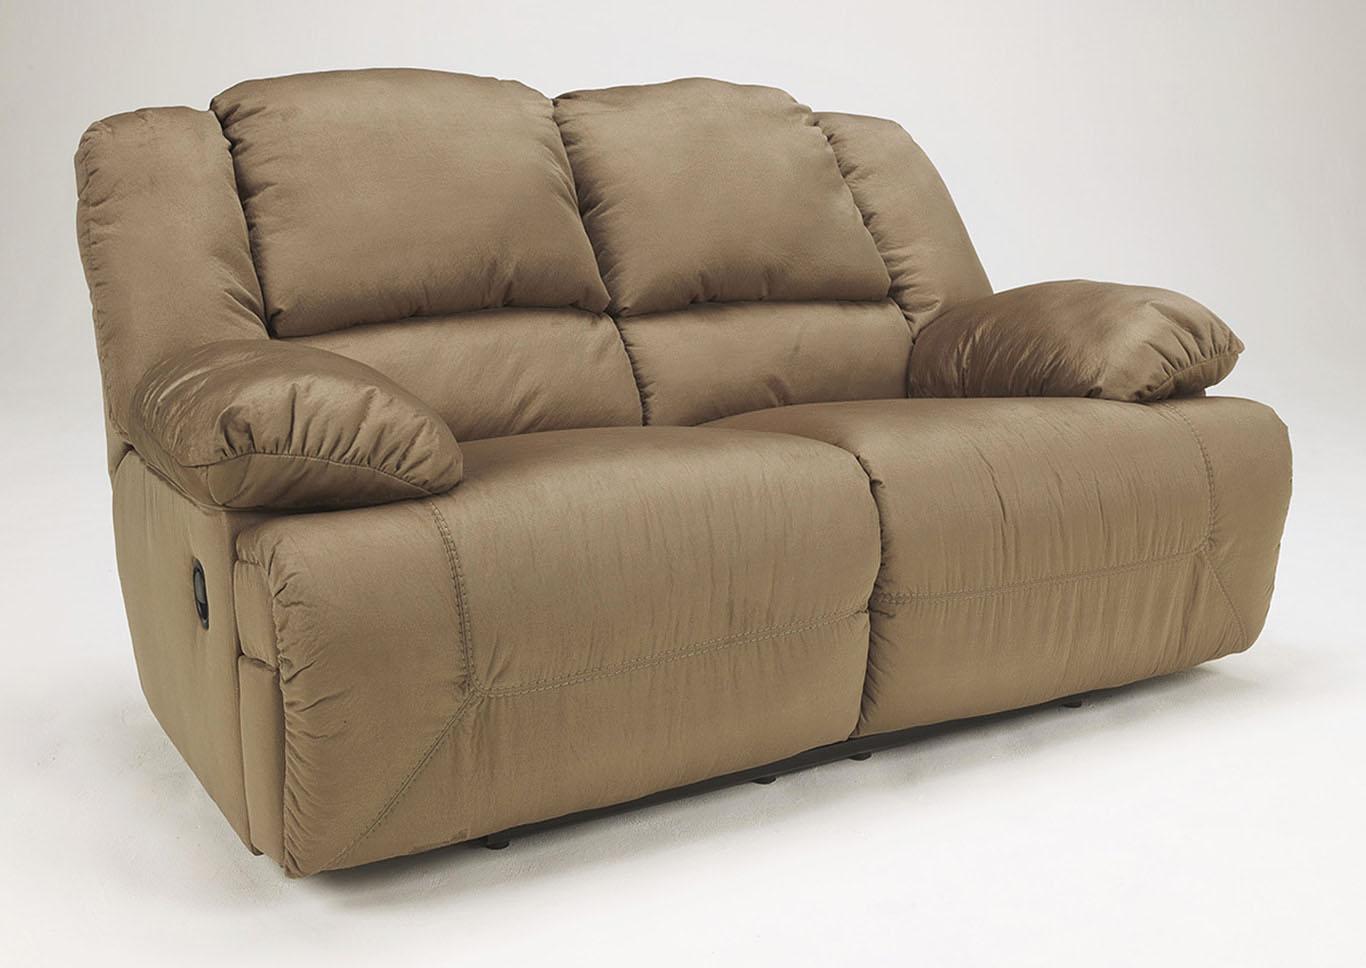 Furniture outlet chicago il hogan mocha reclining loveseat for Ashley hogan mocha pressback chaise